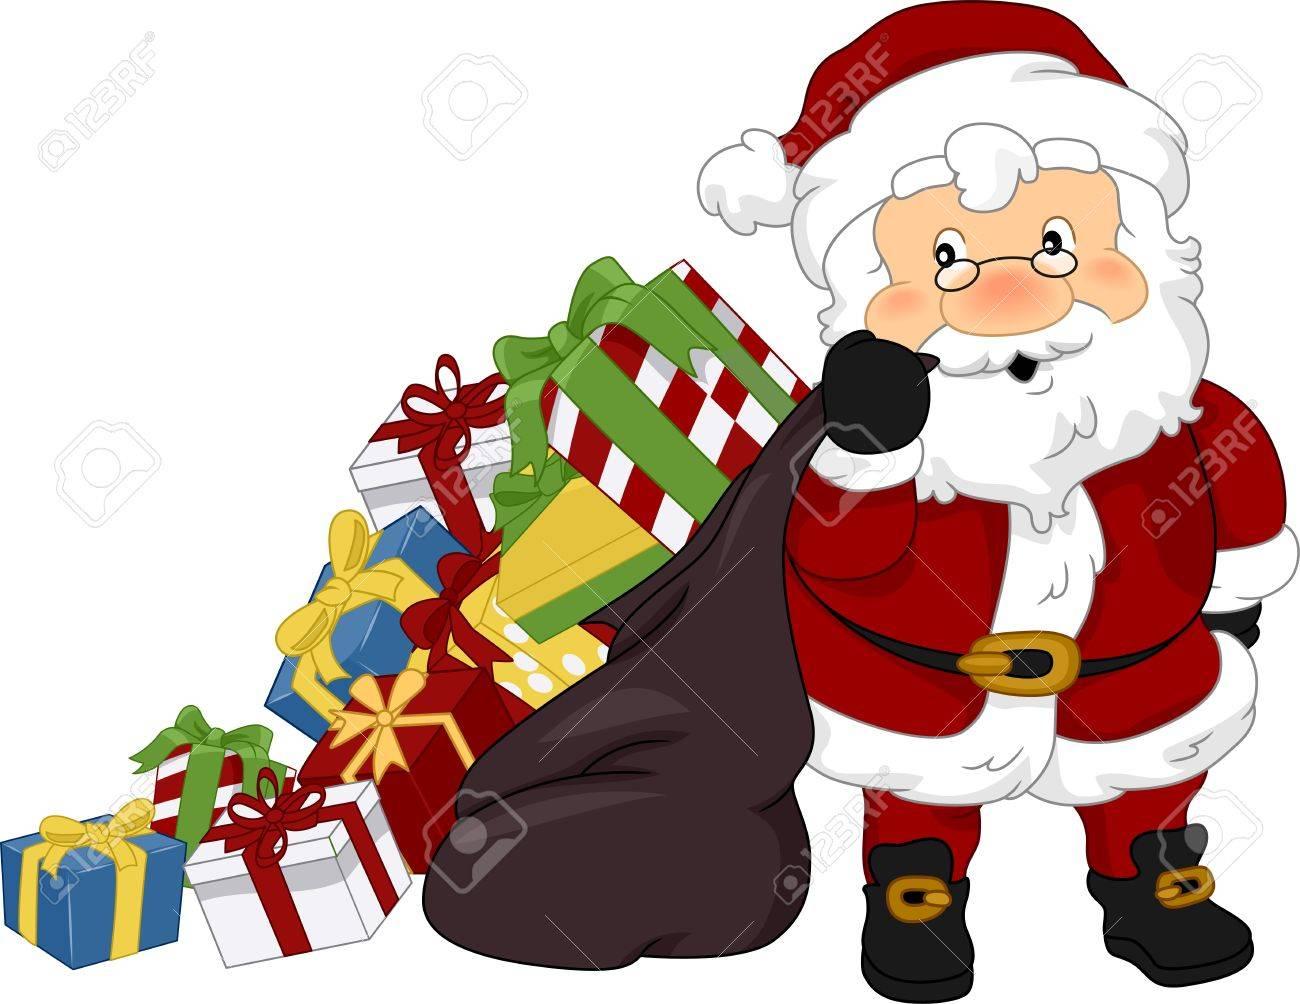 Illustration of Santa Claus Carrying Christmas Presents Stock Illustration - 11378369